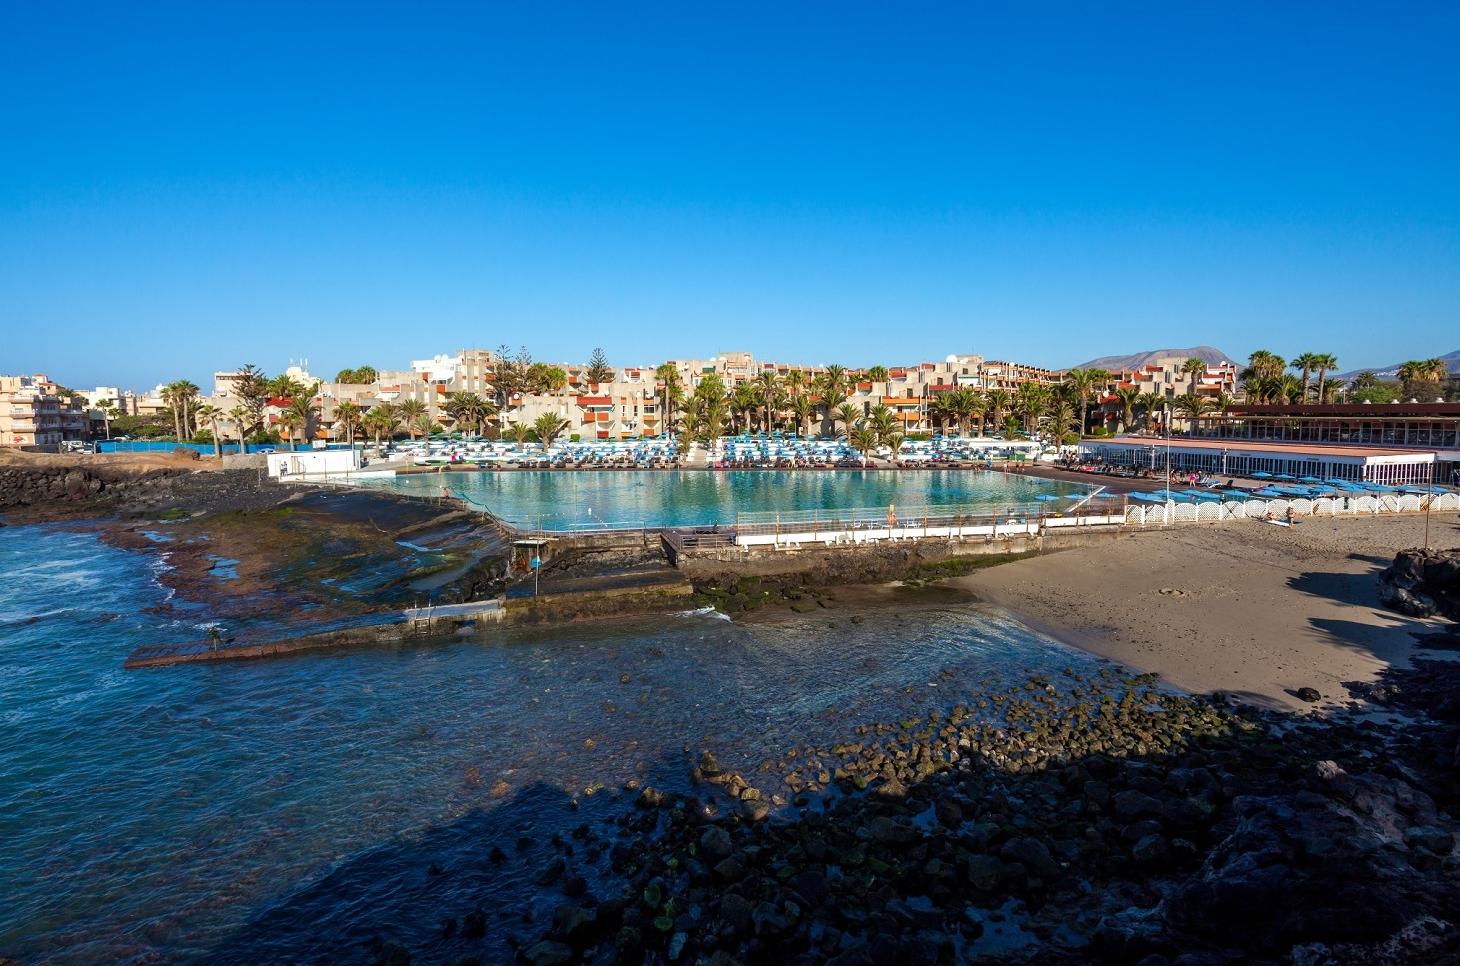 Alborada Beach Club photo